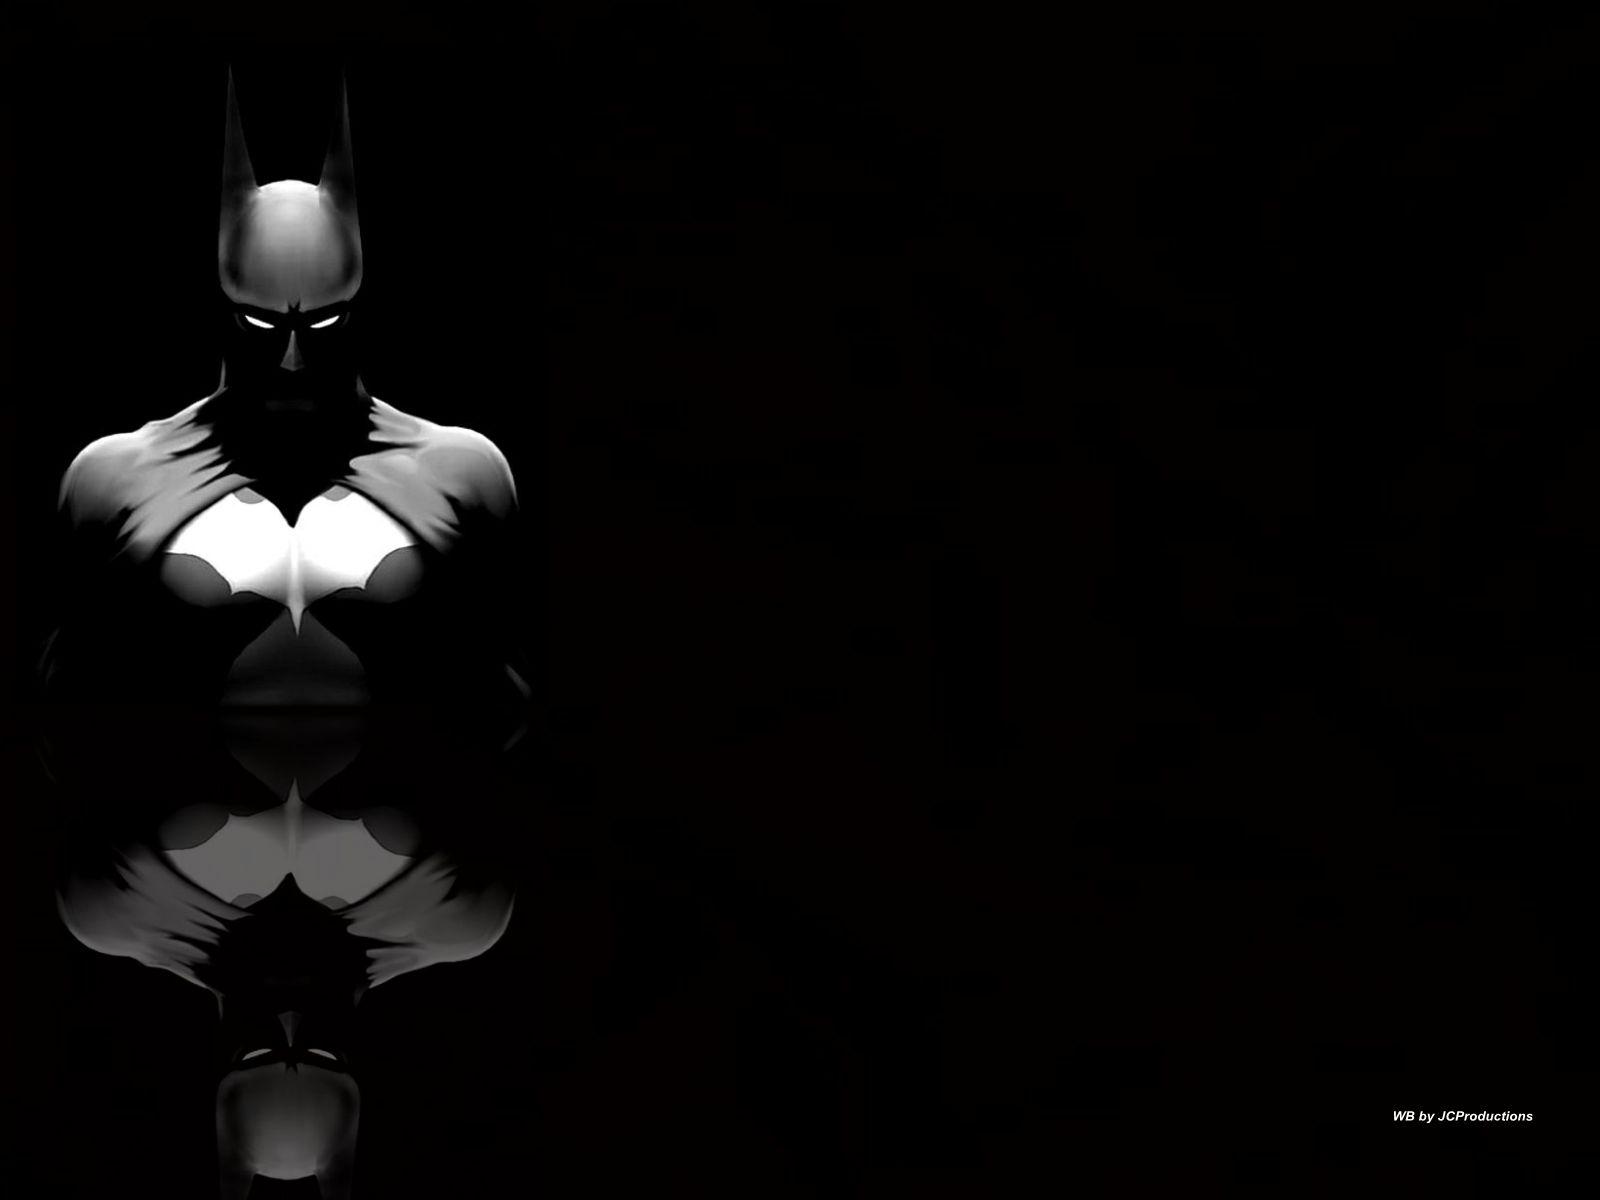 Free Download Batman Images Batman The Dark Knight Hd Wallpaper